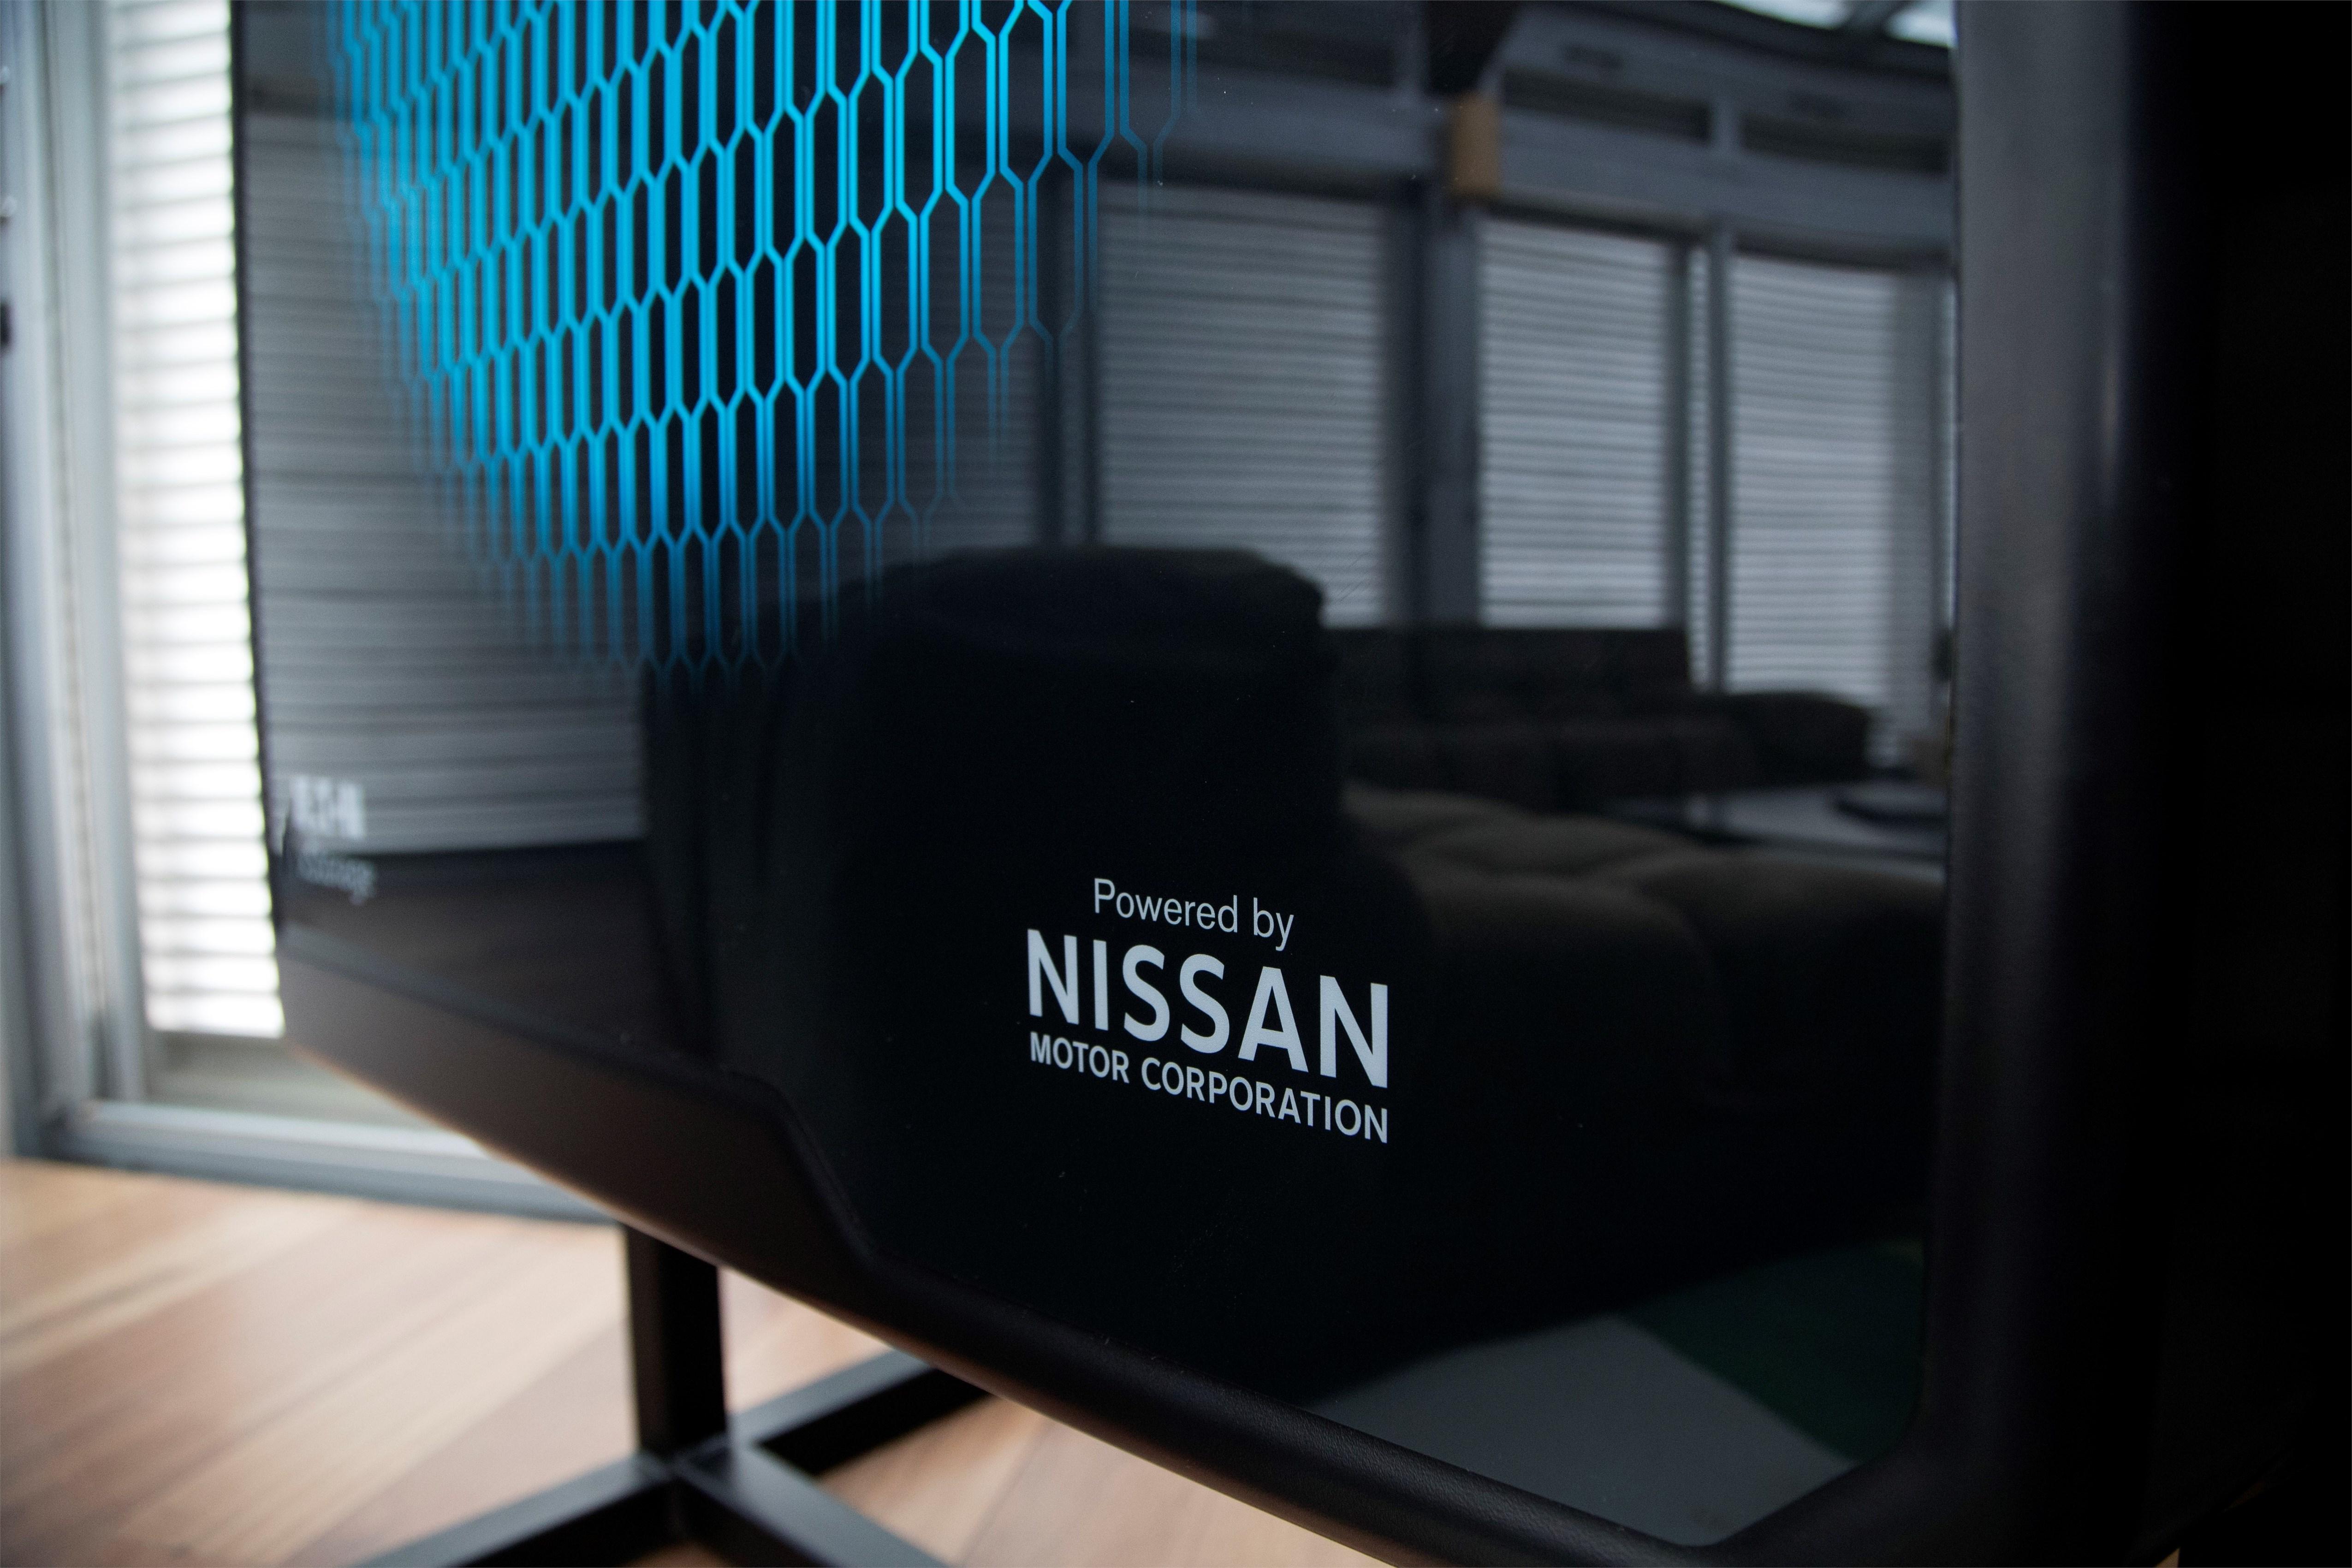 Nissan estreia novo Ecossistema Elétrico na ilha de Tenerife